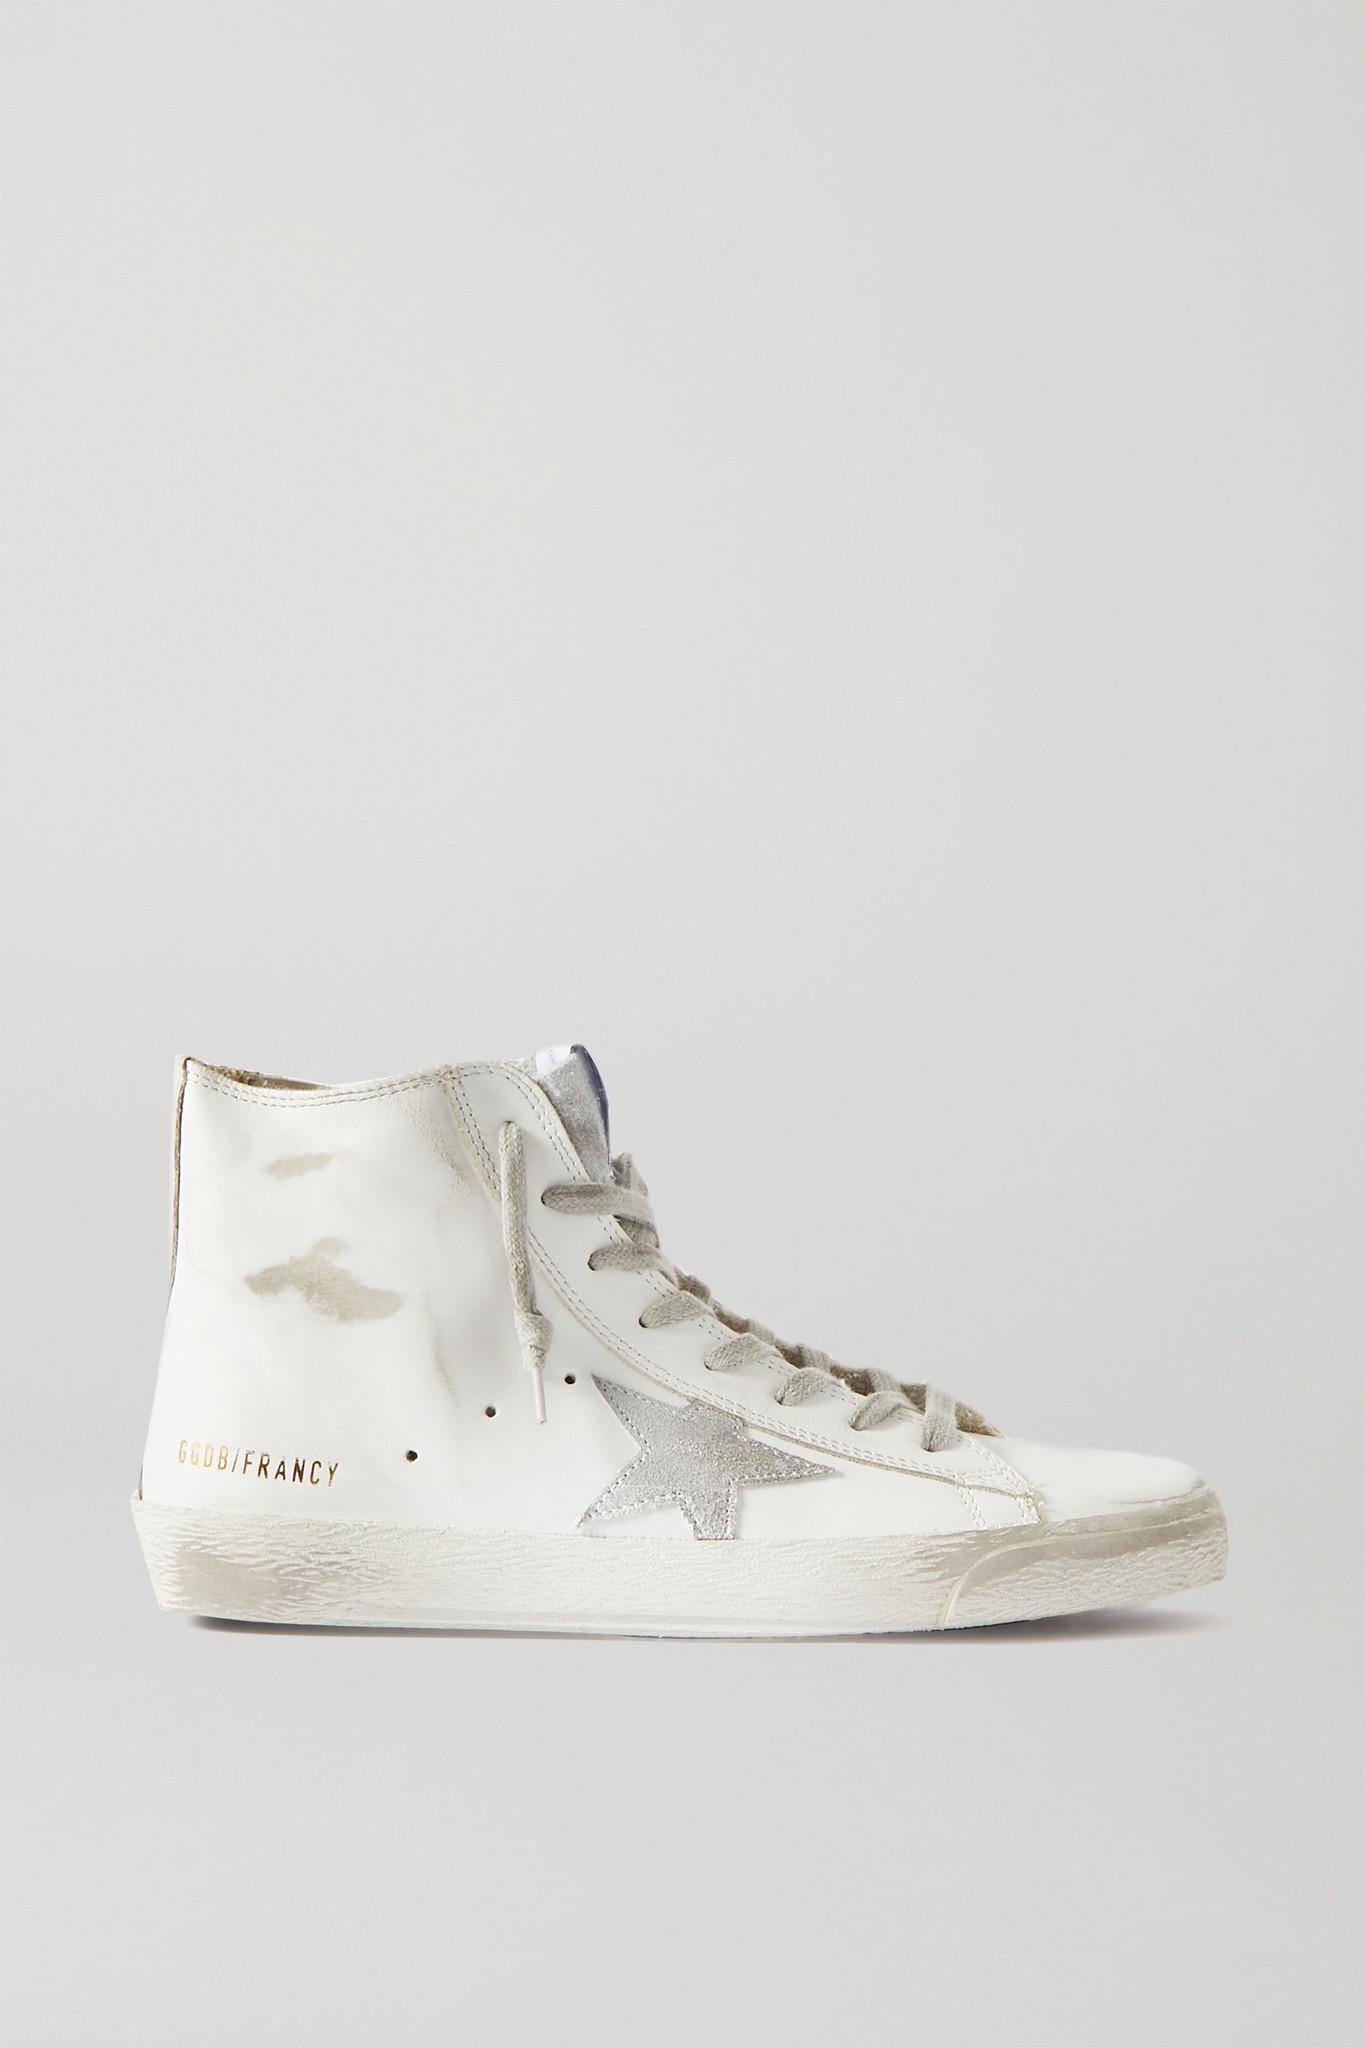 GOLDEN GOOSE - Francy 亮片金葱仿旧皮革绒面革高帮运动鞋 - 白色 - IT40